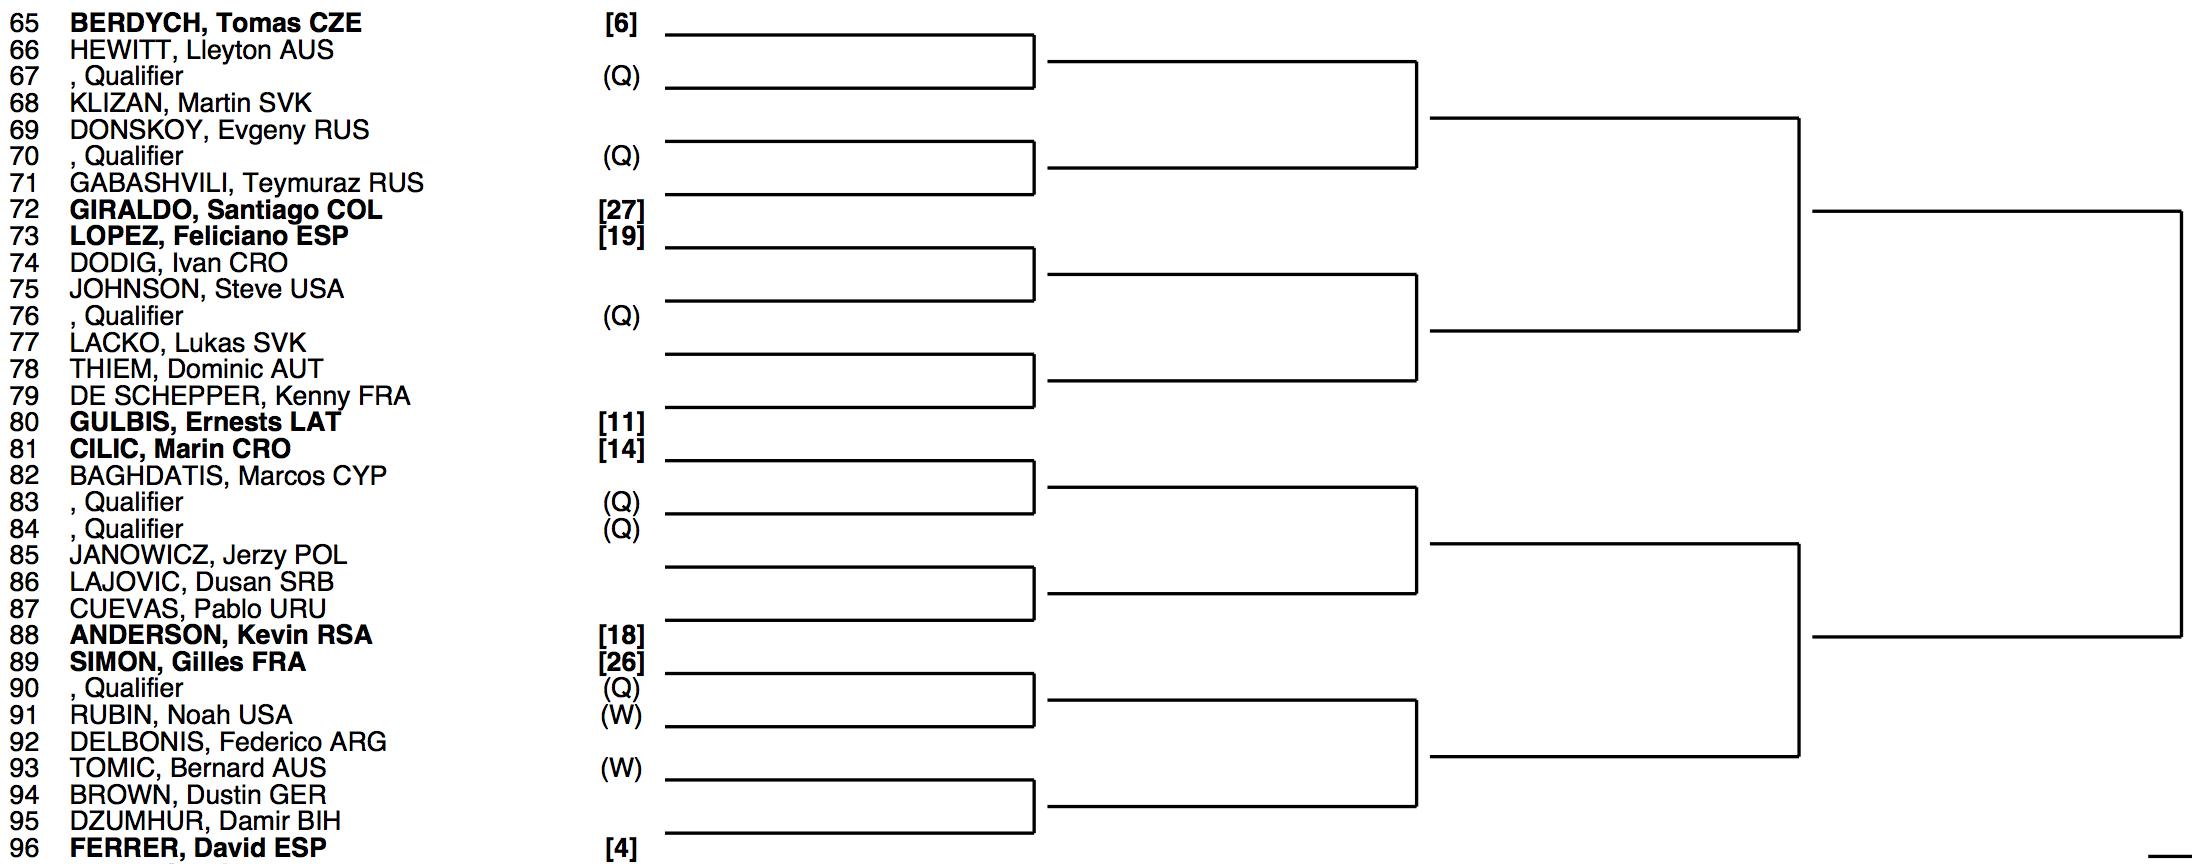 US Open 2014 draw 3:4